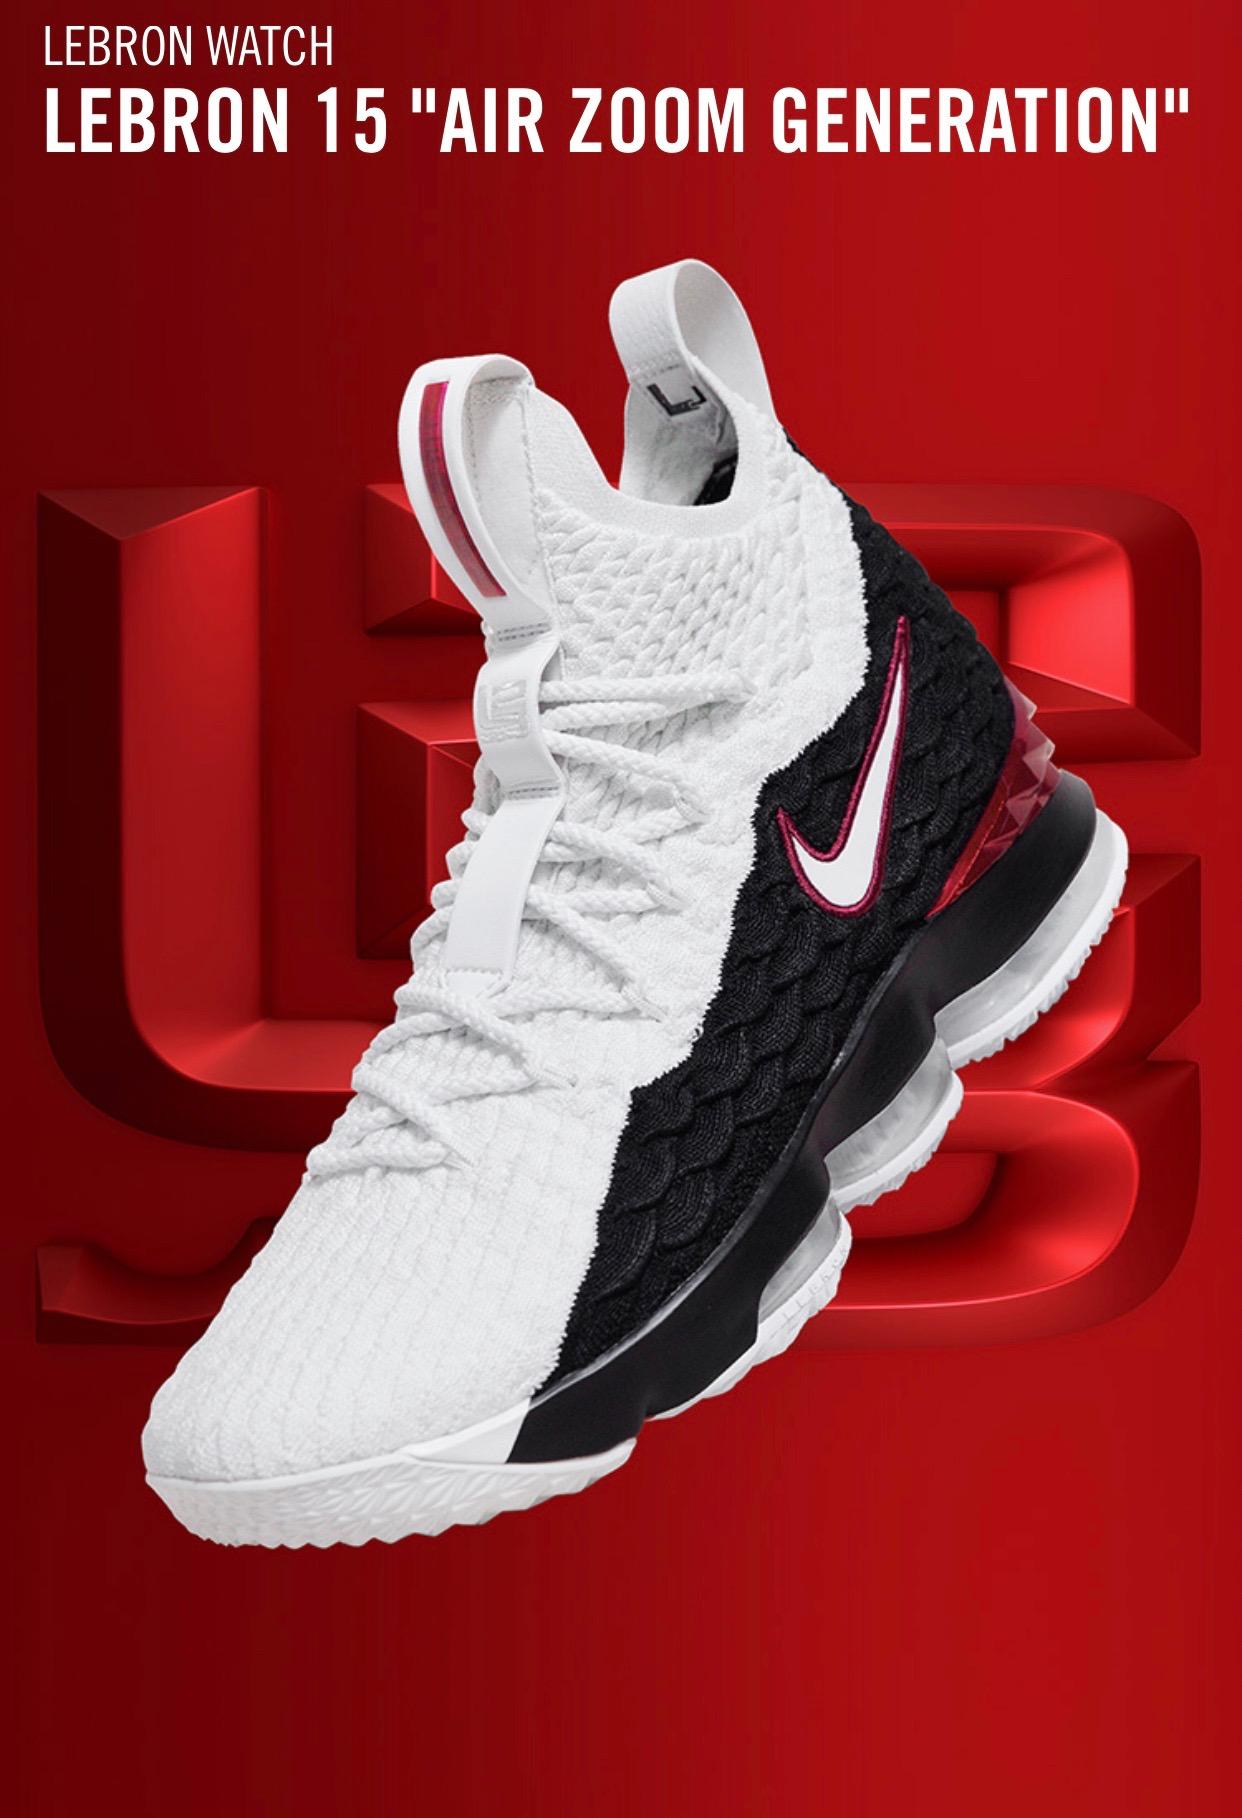 Nike LeBron 15 AZG lebron watch